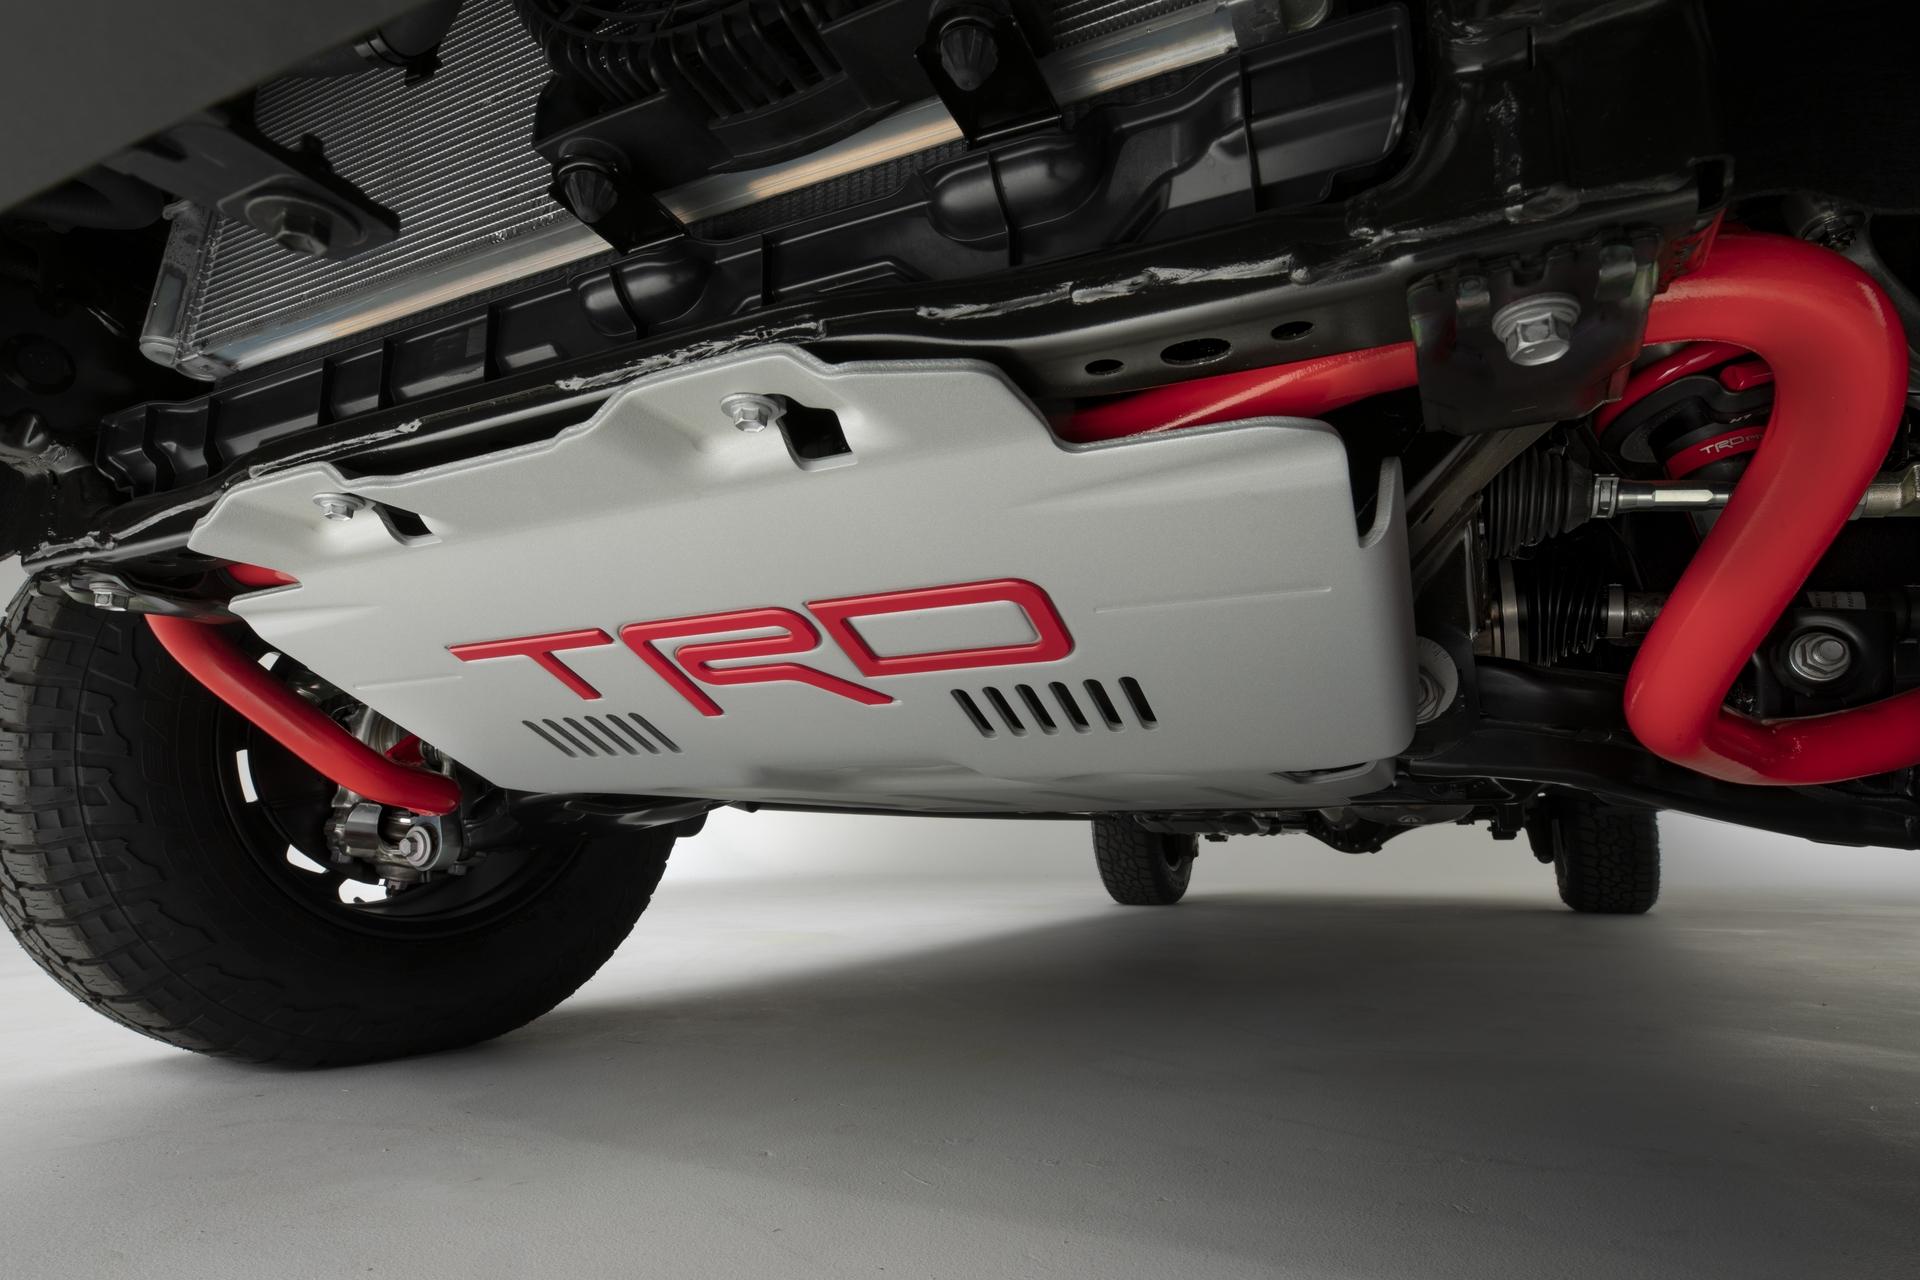 2022_Toyota_Tundra_Teaser_8-10_001